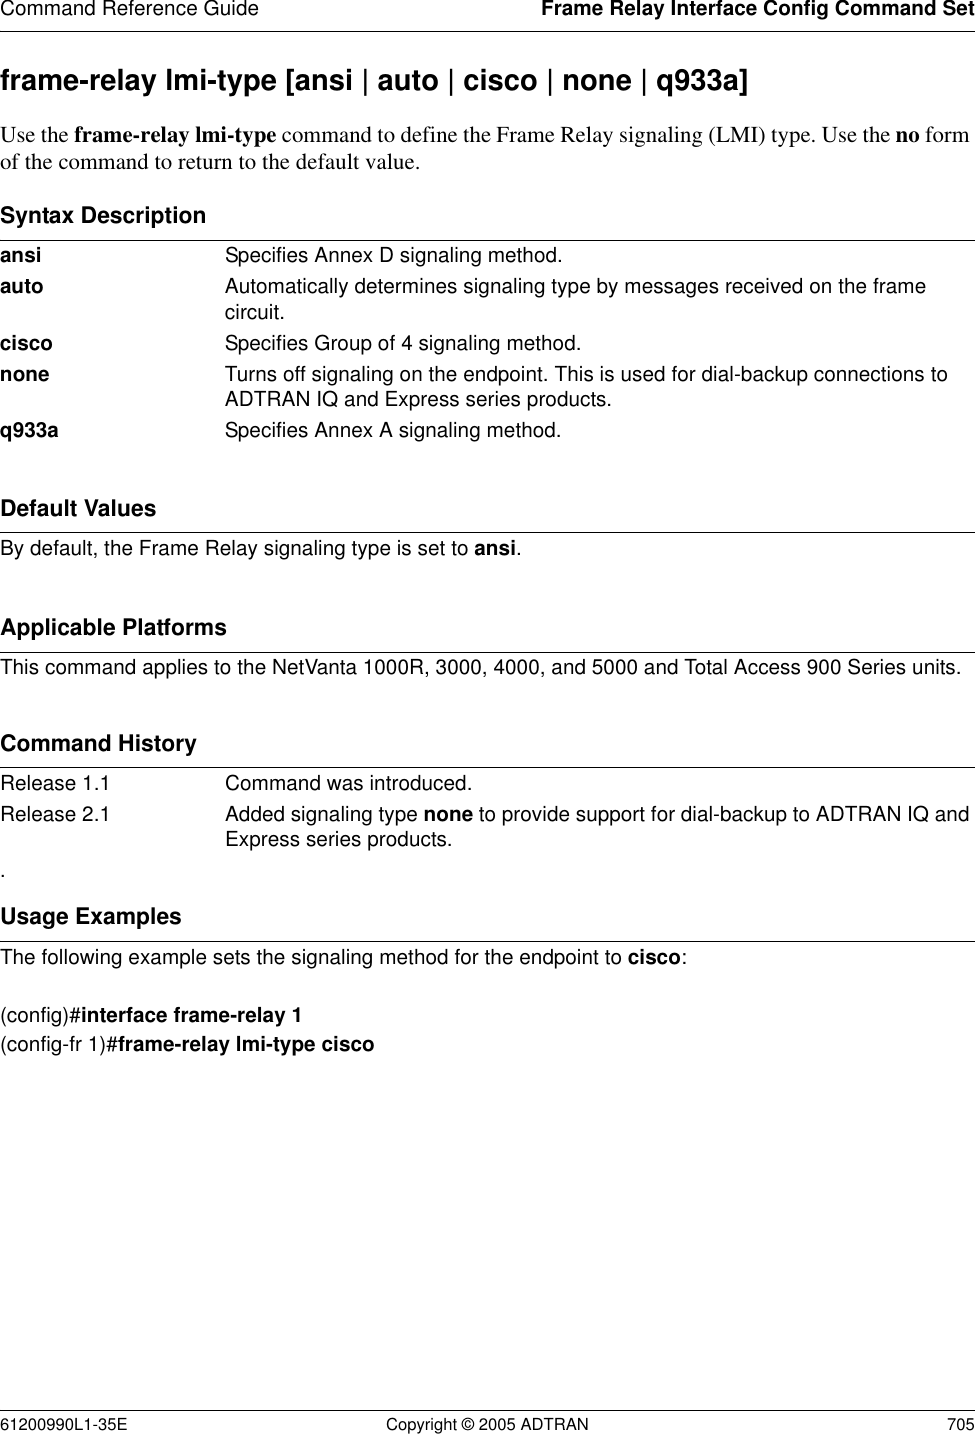 Adtran Total Access 5000 Command Reference Manual ManualsLib